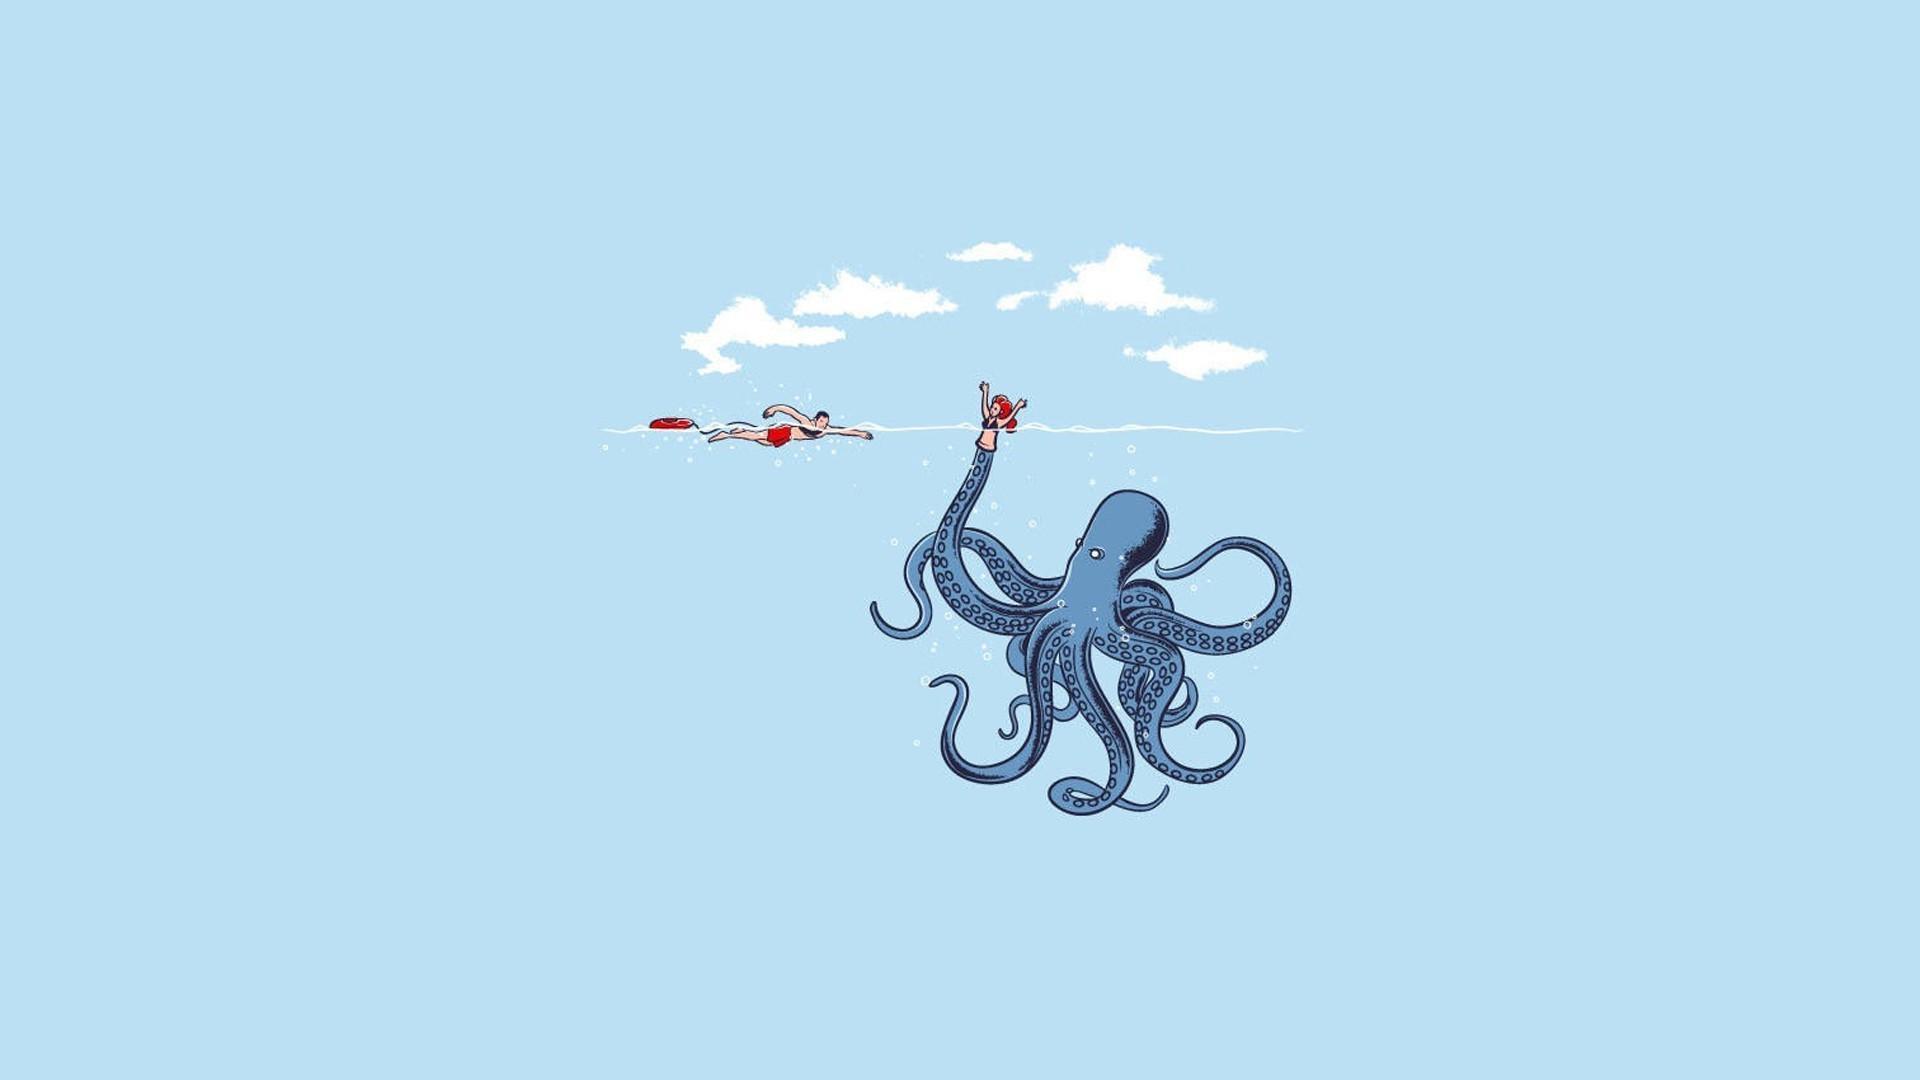 Cute Wallpapers Love Friendship Humor Minimalism Simple Blue Octopus Wallpapers Hd